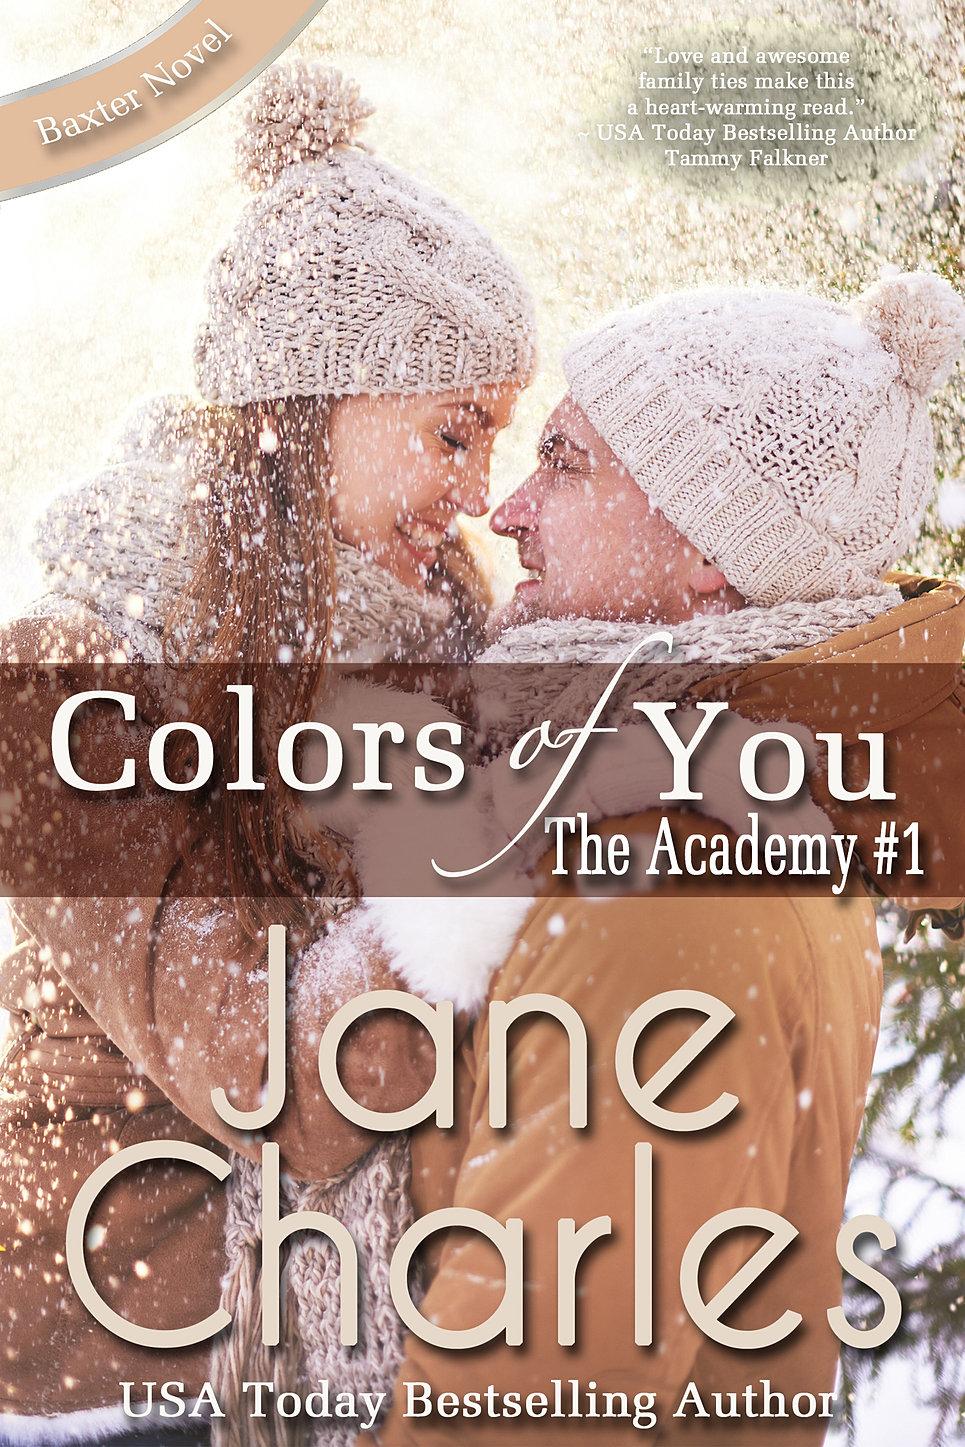 colorsofyou (4)